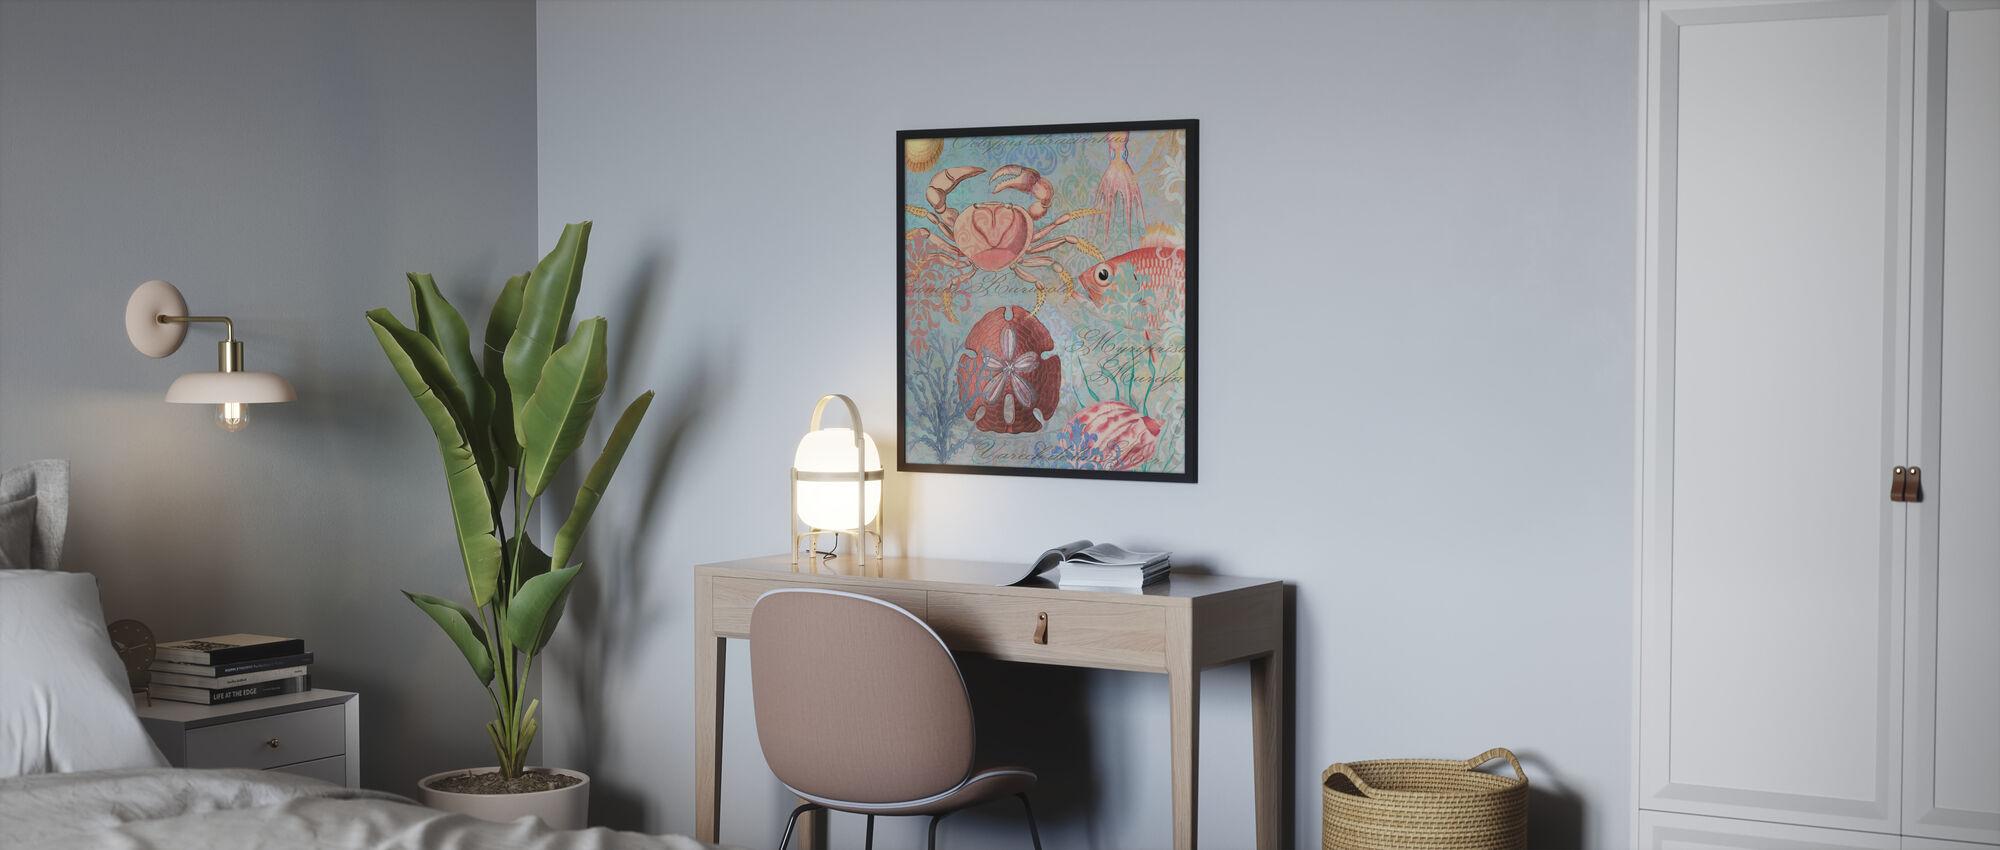 Sea Life Arabesques - Poster - Bedroom